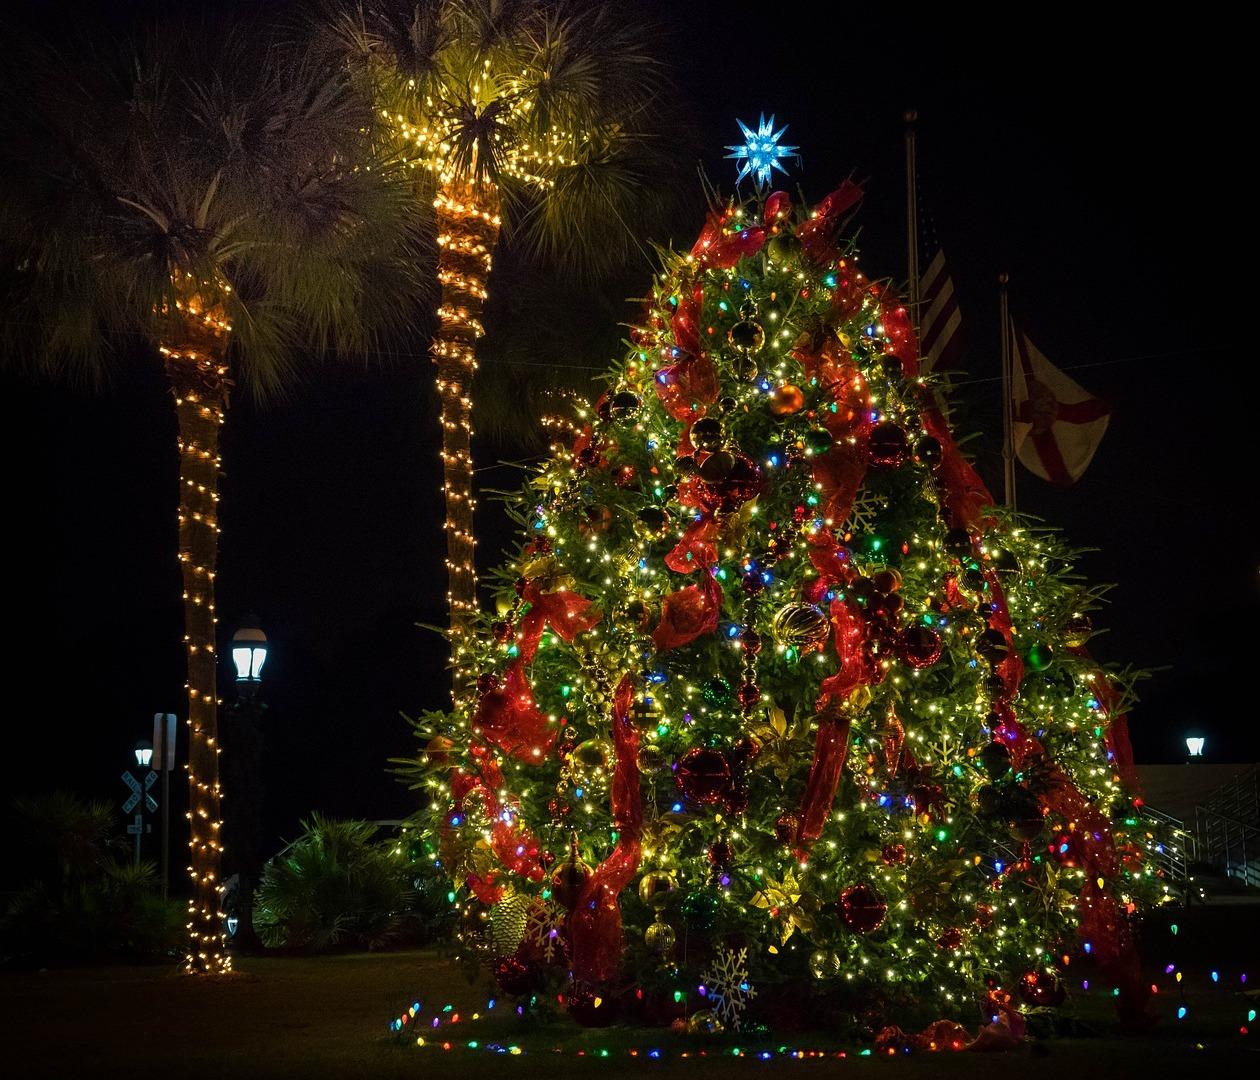 how to celebrate christmas in florida - Florida Christmas